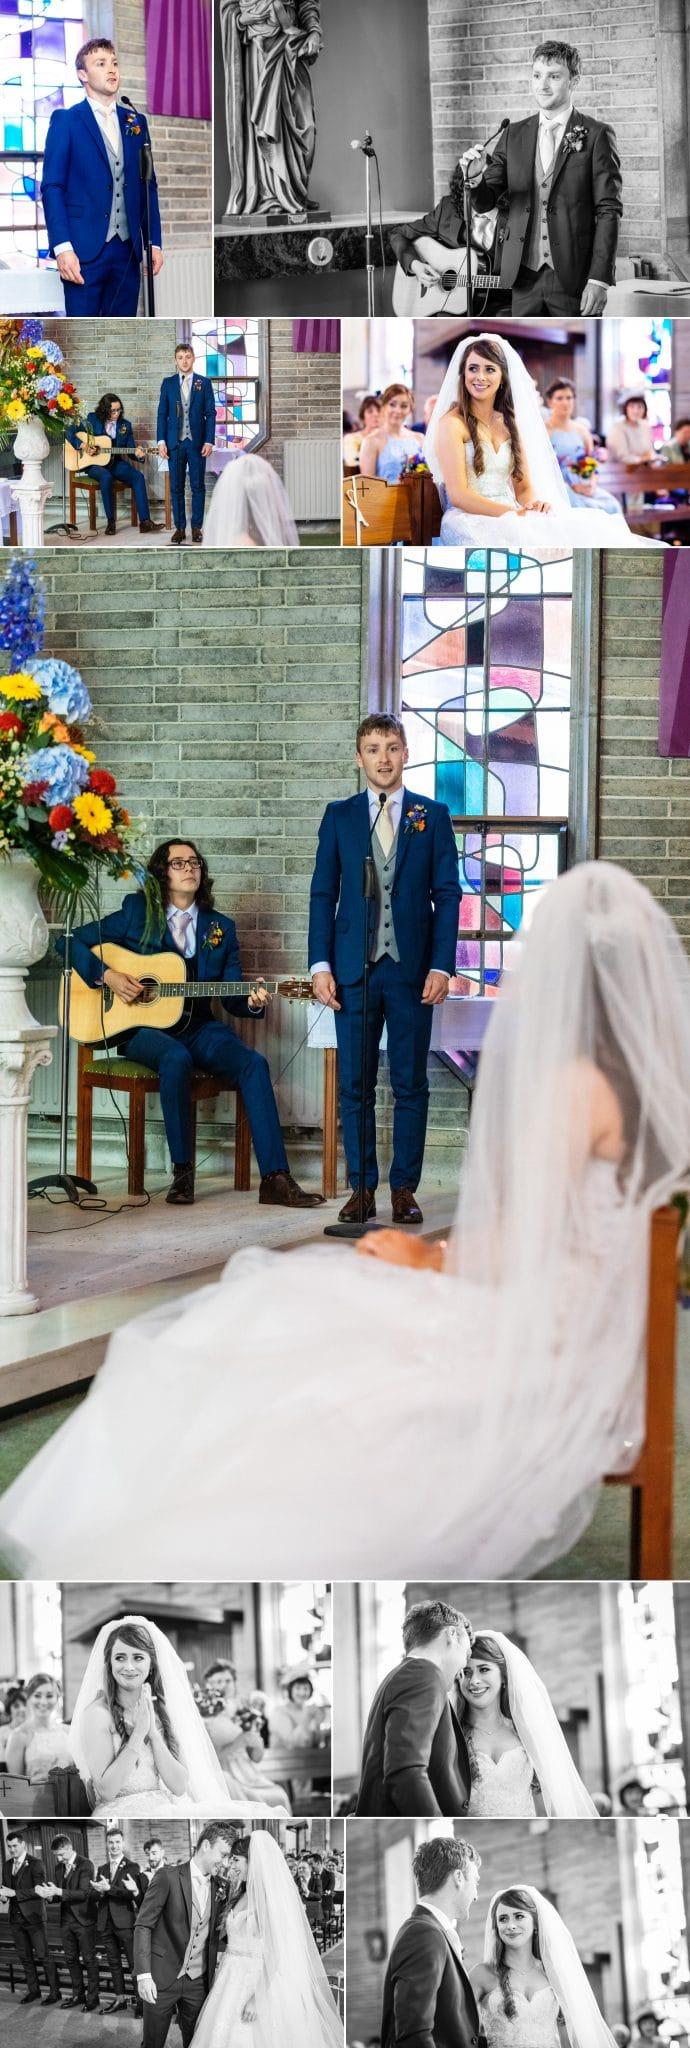 Claregalway Church Wedding Liam Kidney Photography